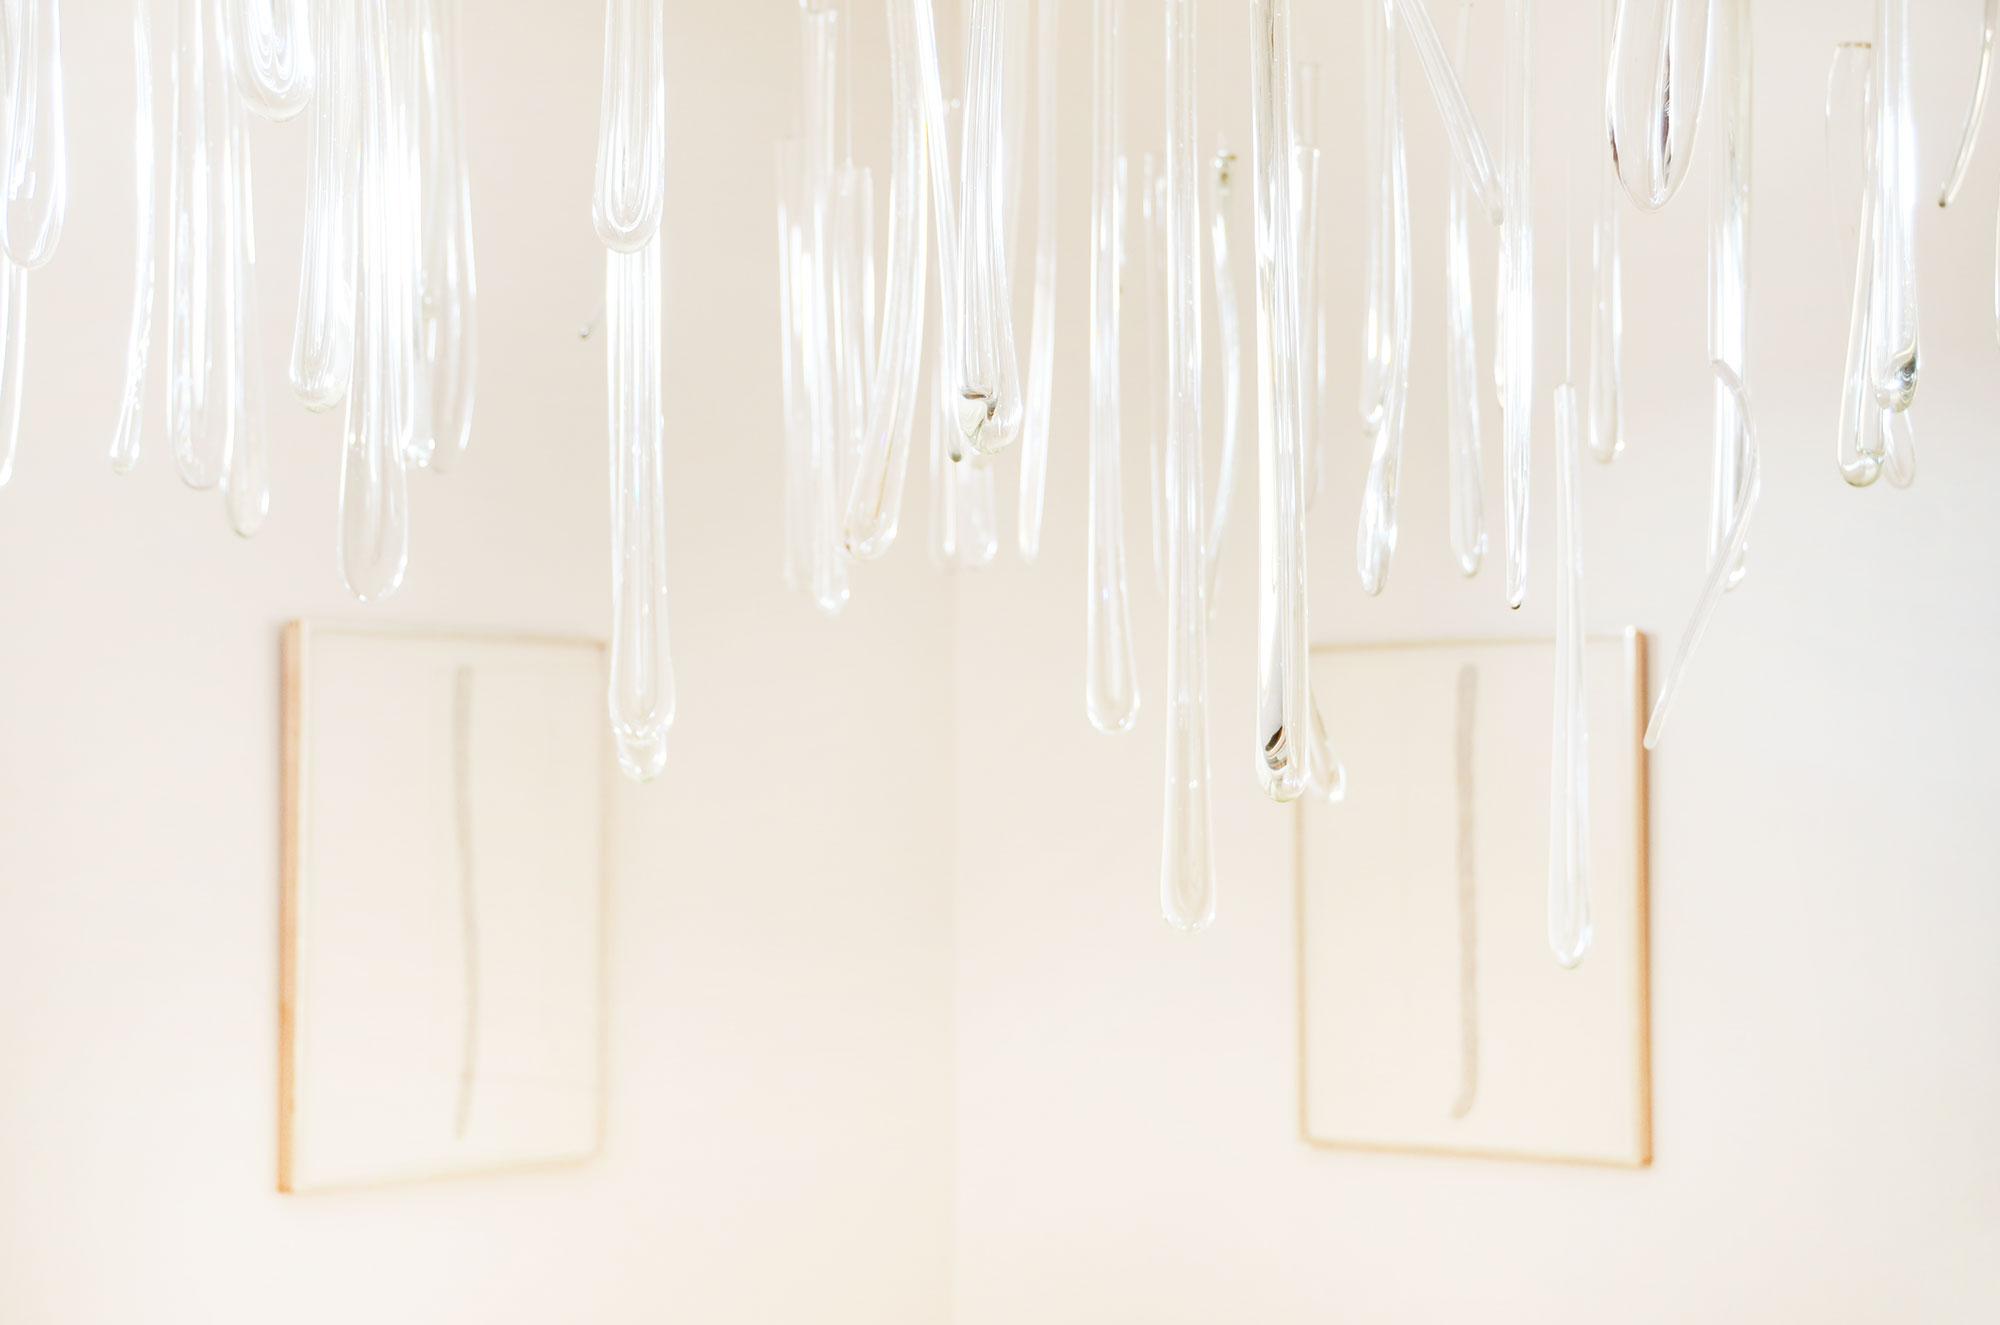 Glass Tongues by Nancy Riegelman